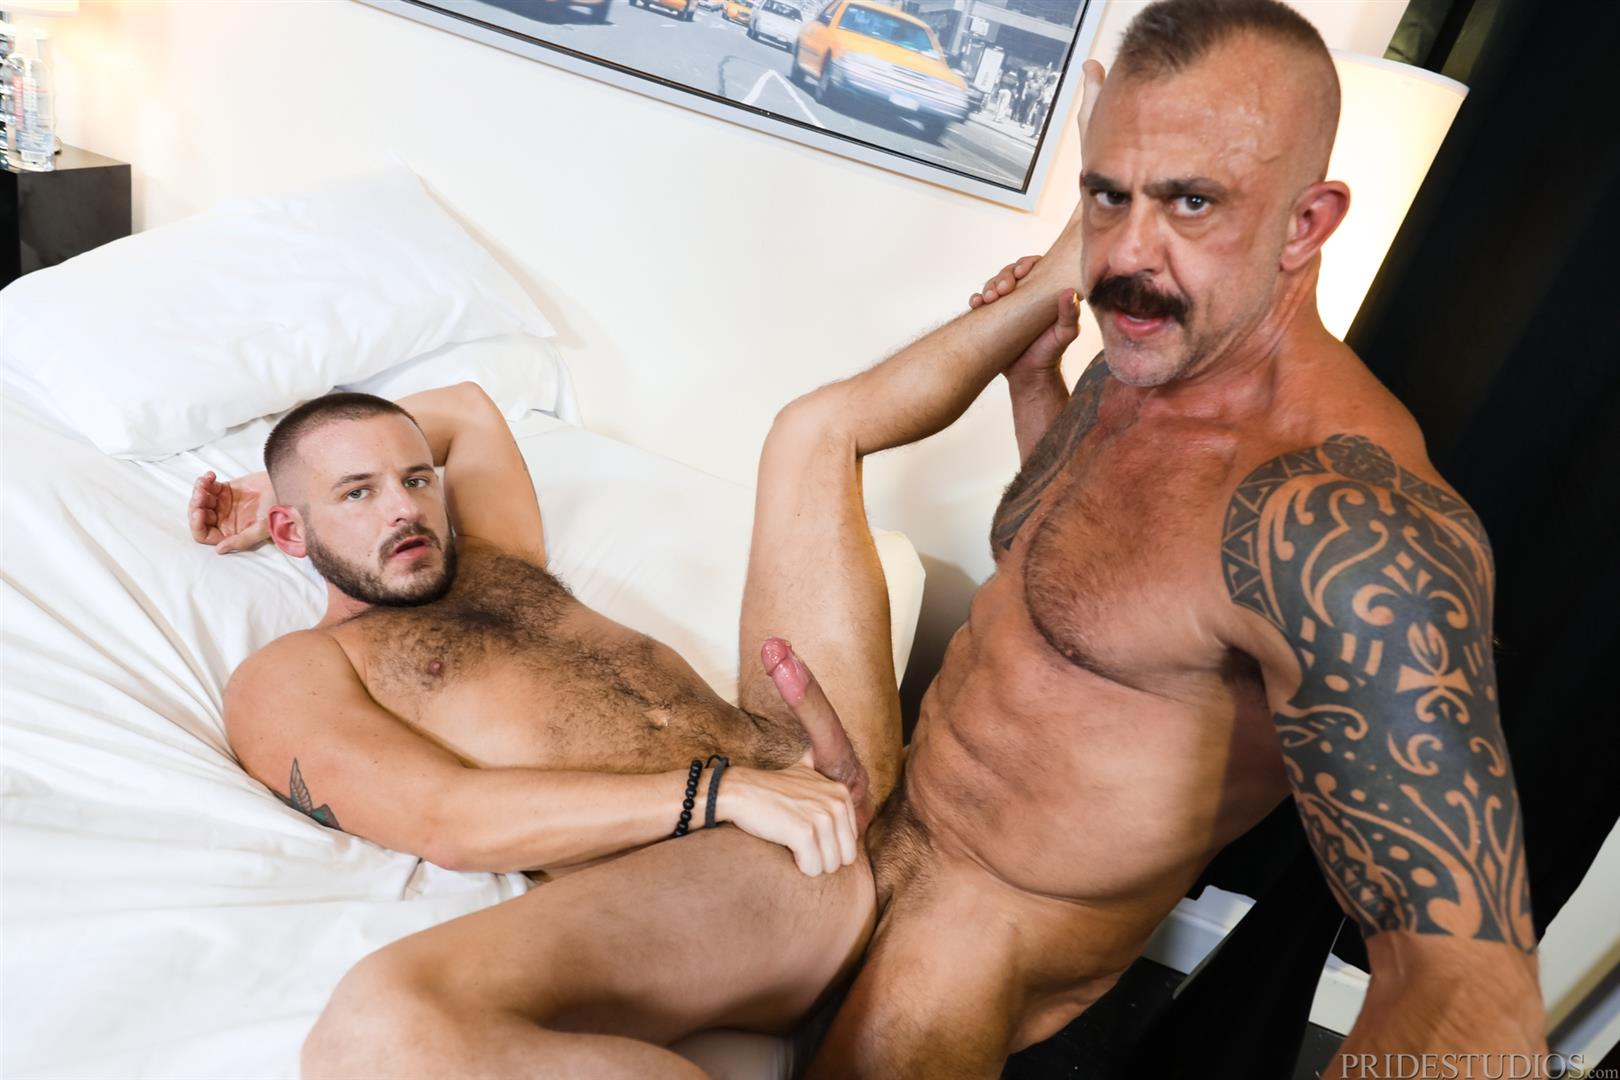 Men-Over-30-Jon-Galt-and-Sean-Harding-Muscle-Daddy-Barebacking-Muscle-Cub-15 Muscle Daddy Jon Galt And Muscle Cub Sean Harding Bareback Flipping